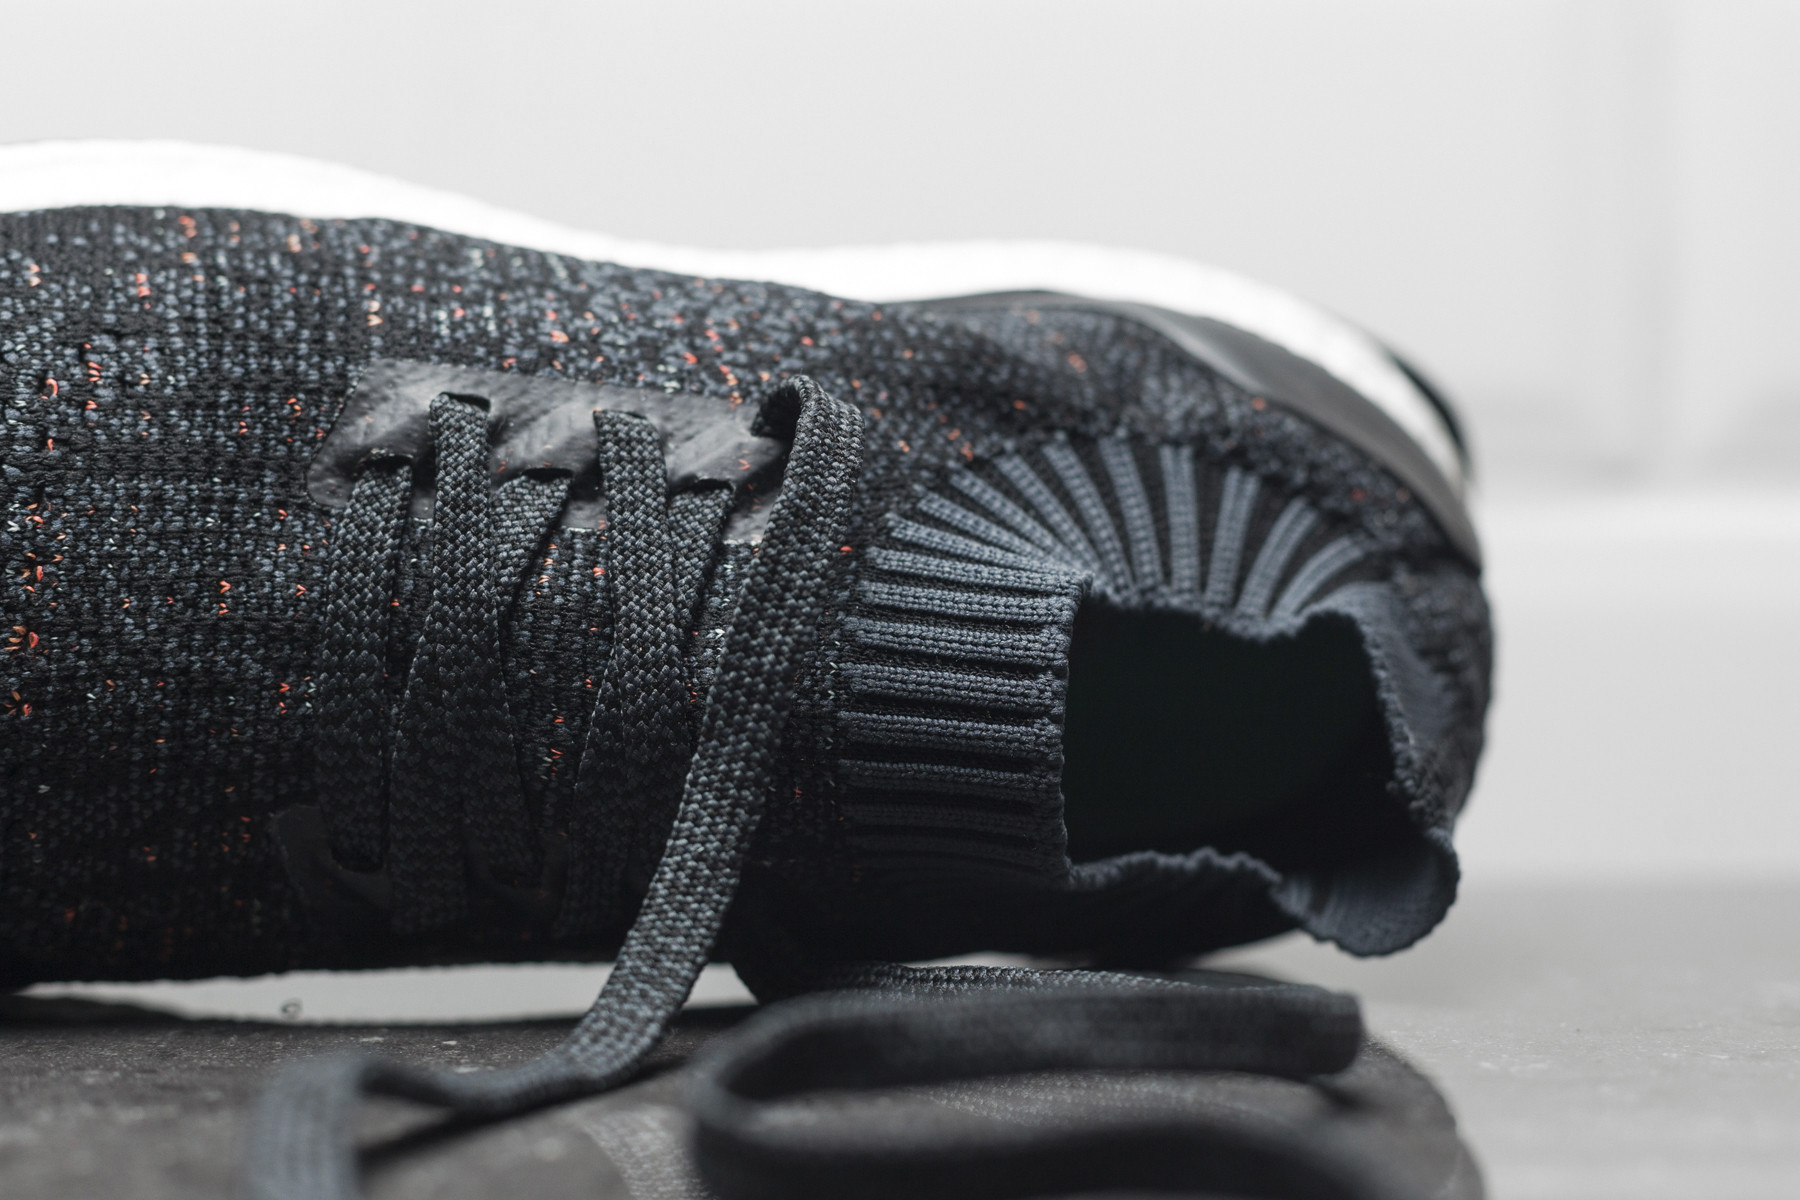 finest selection 2e7e5 a73a9 Adidas UltraBOOST Uncaged W - Sneaker.no